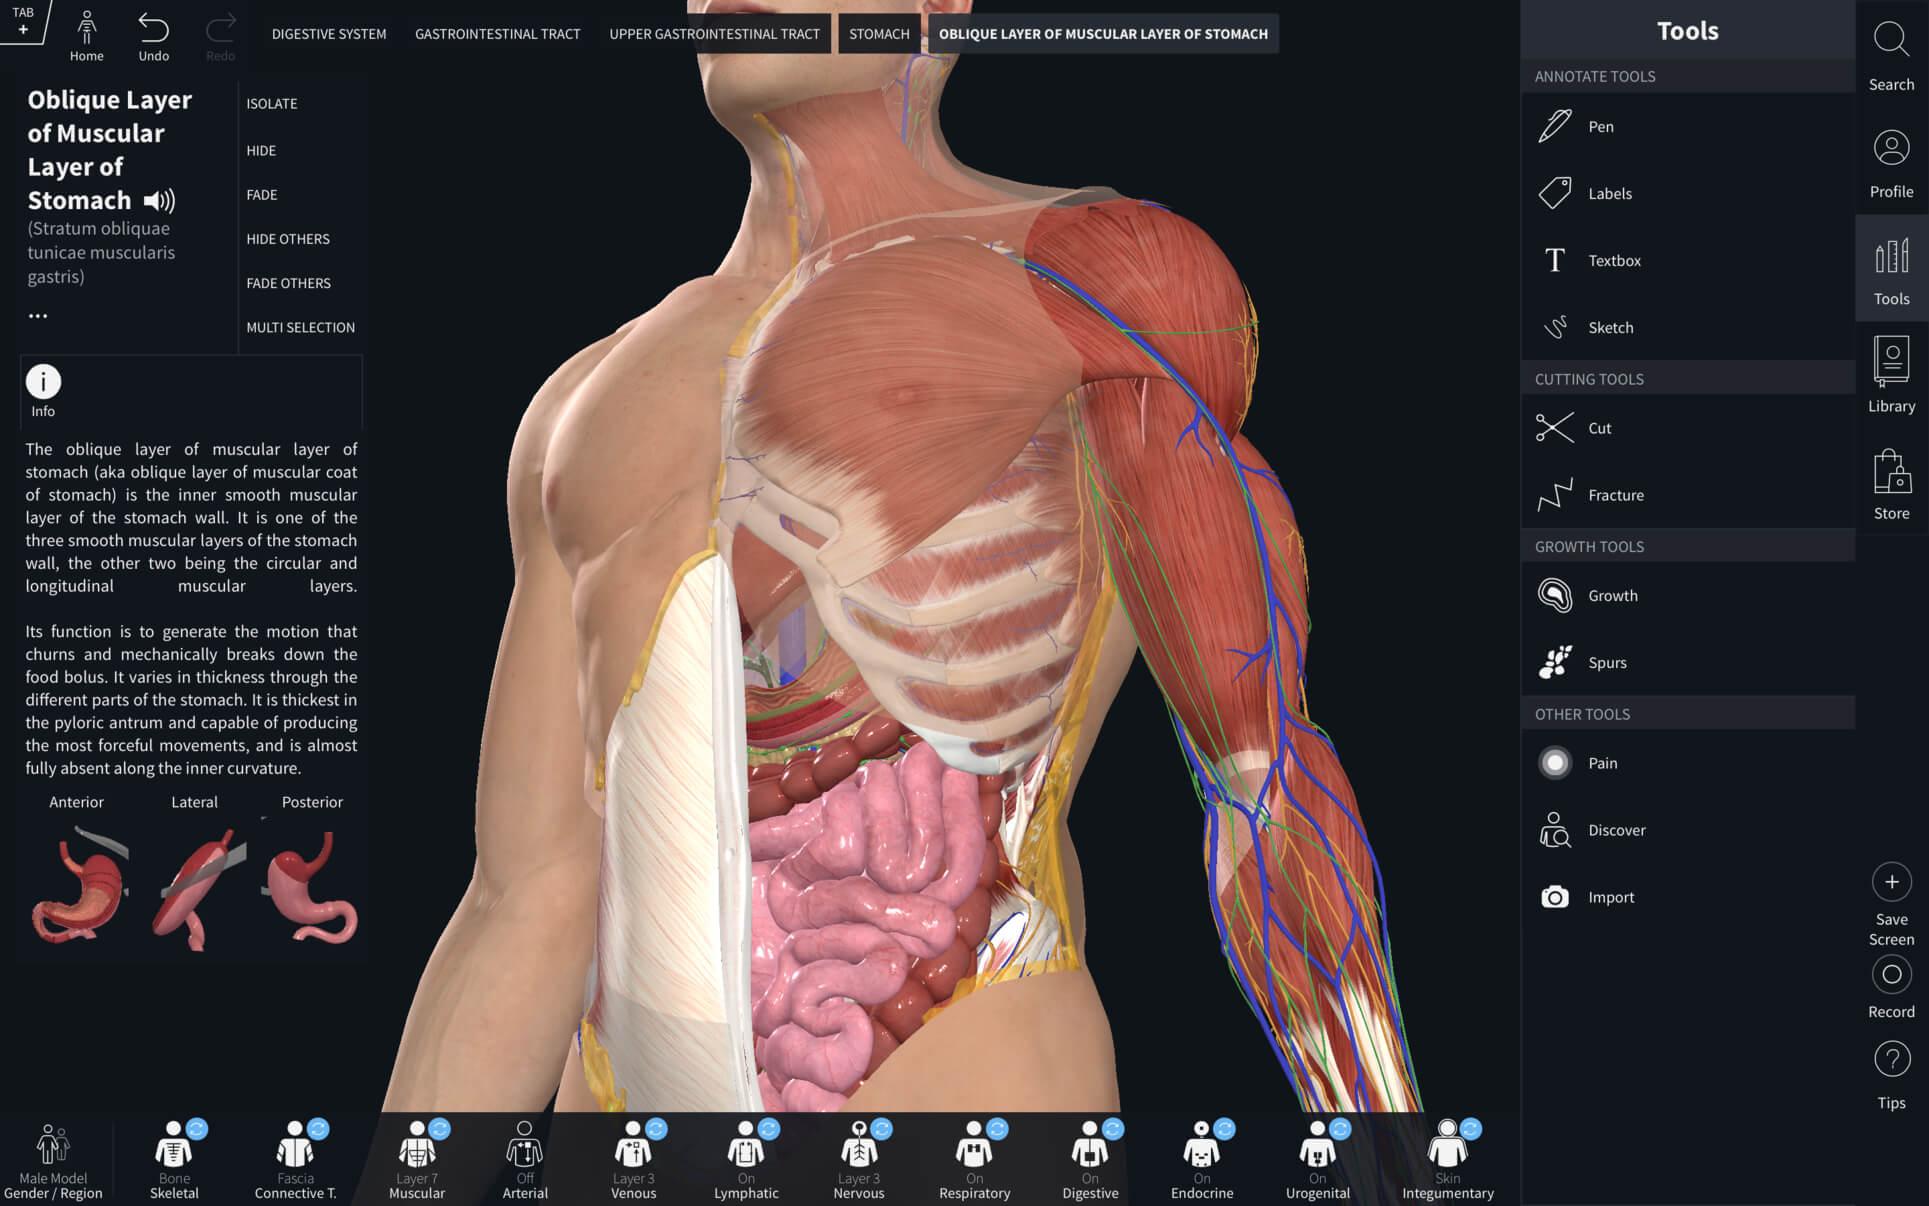 Complete Anatomy 2019 v4.0.1 download | macOS